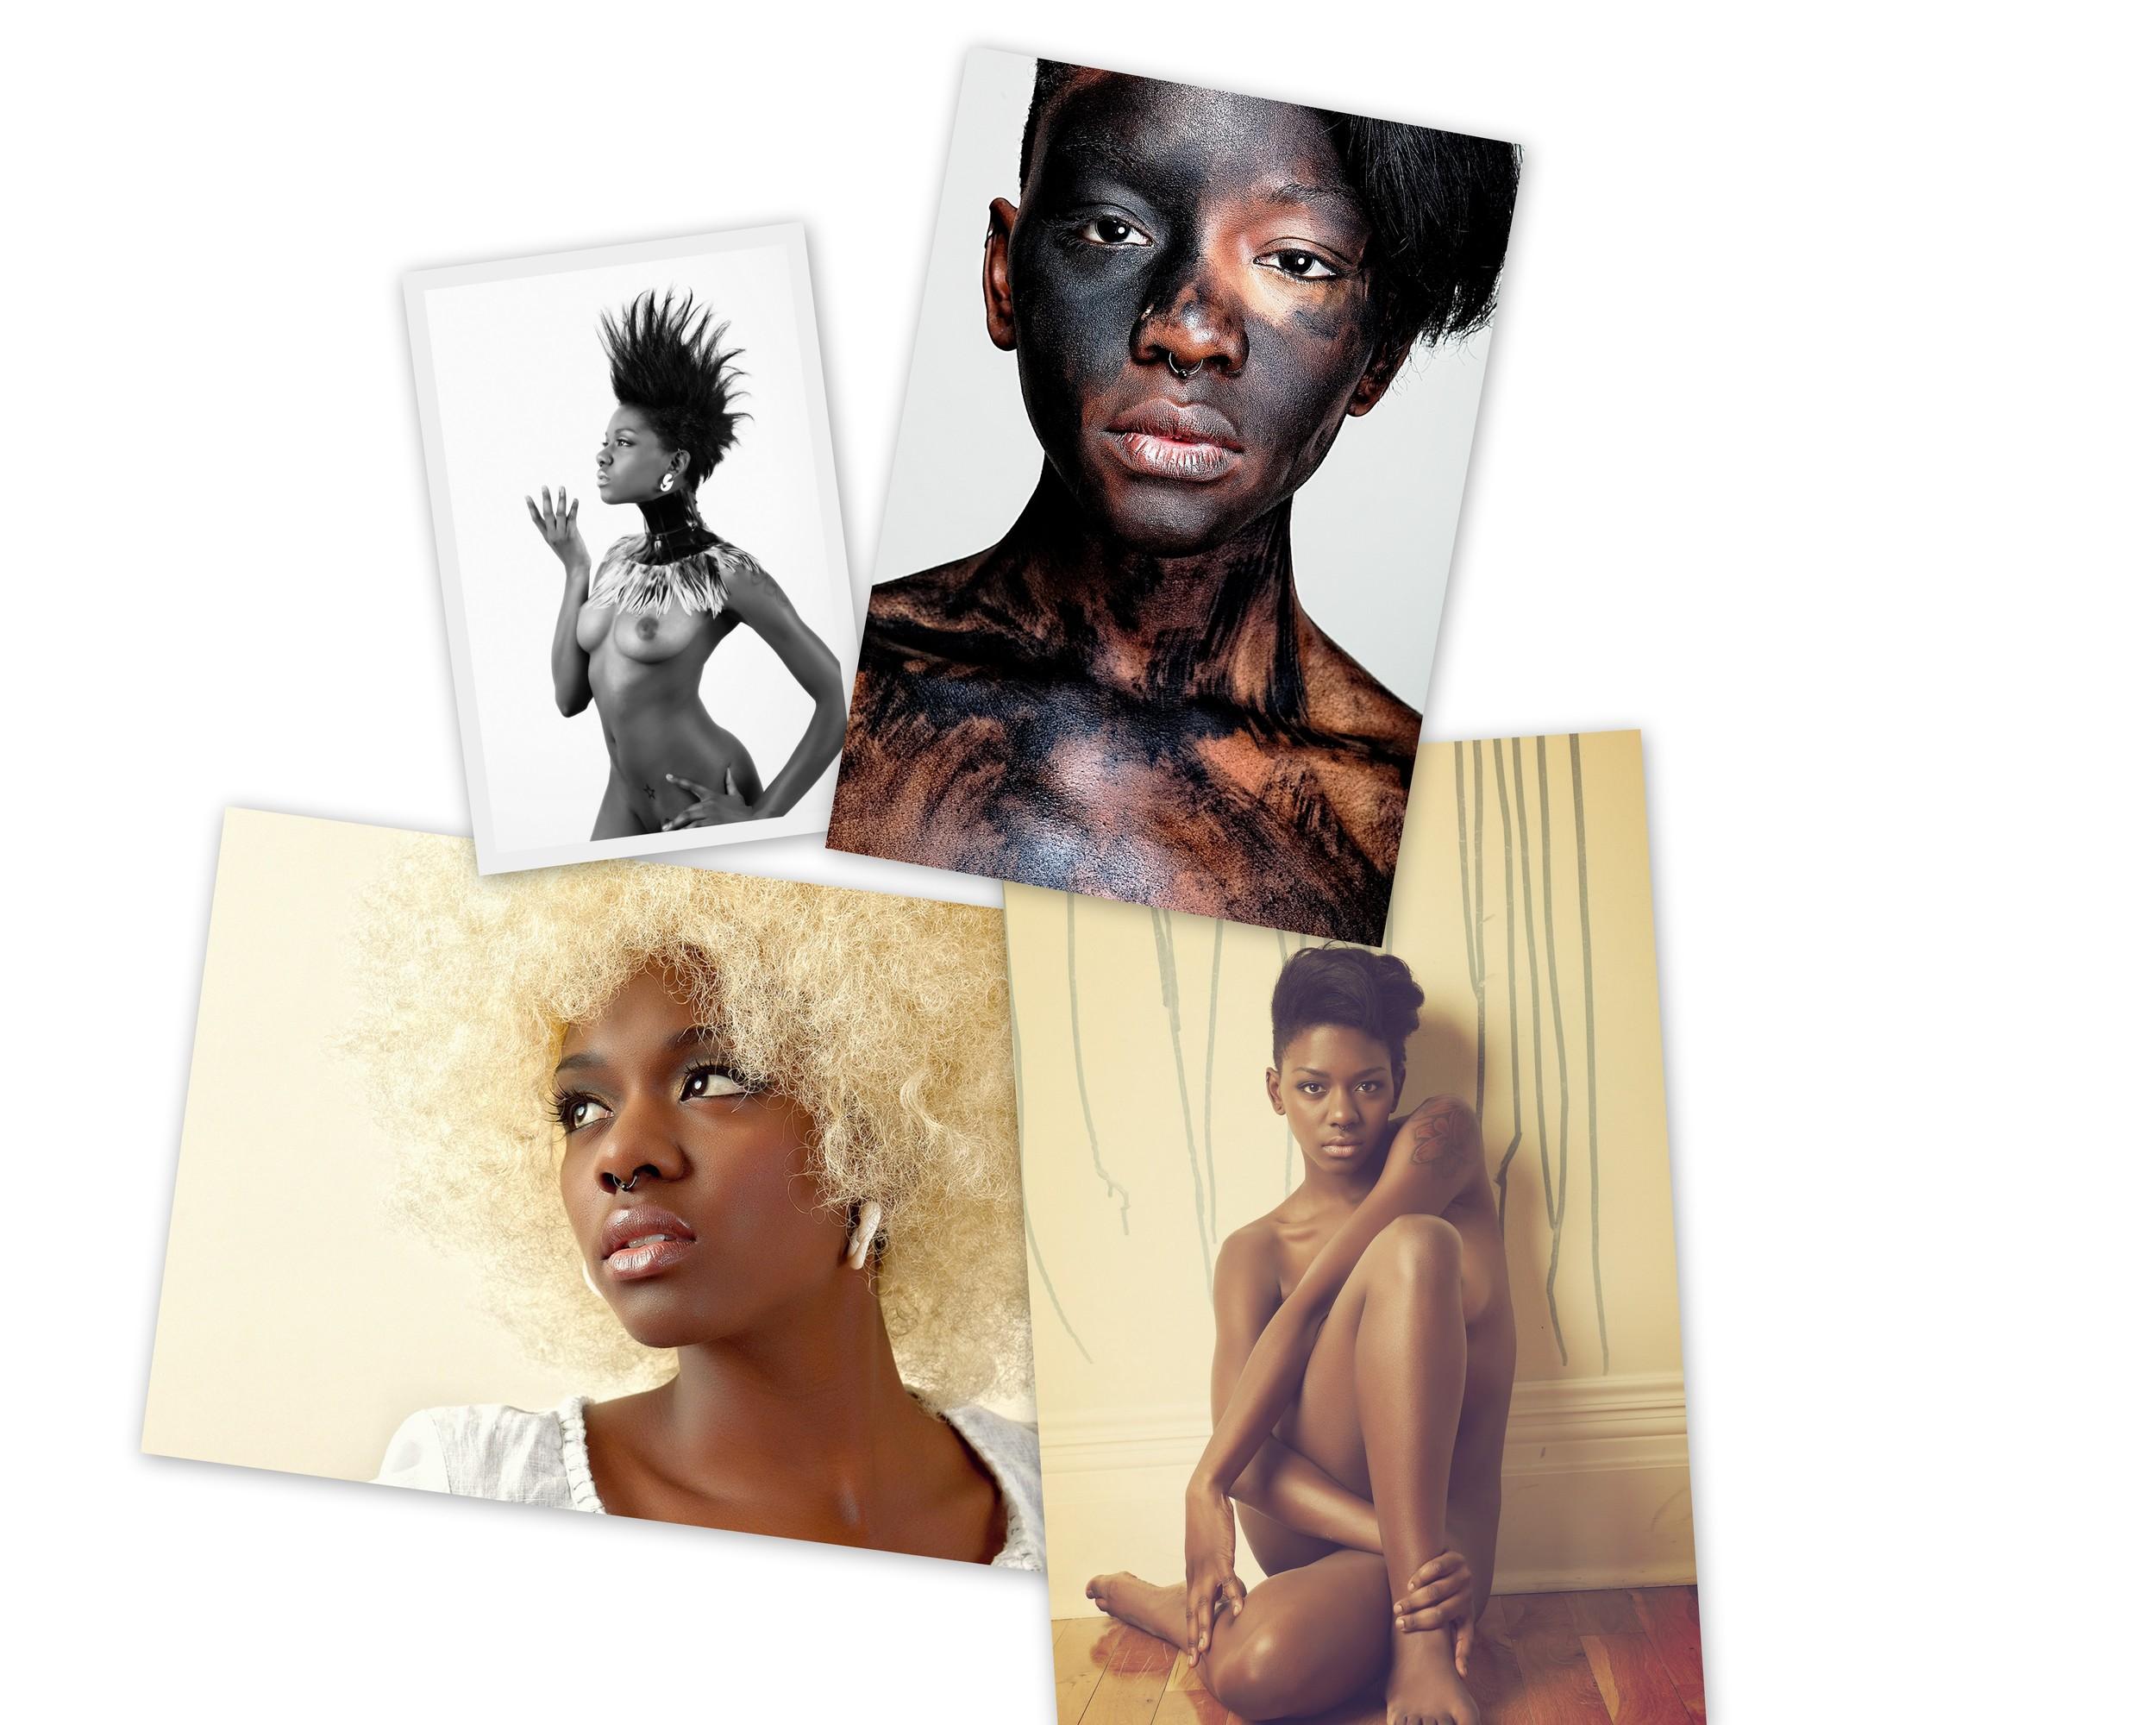 Danielle collage.jpg